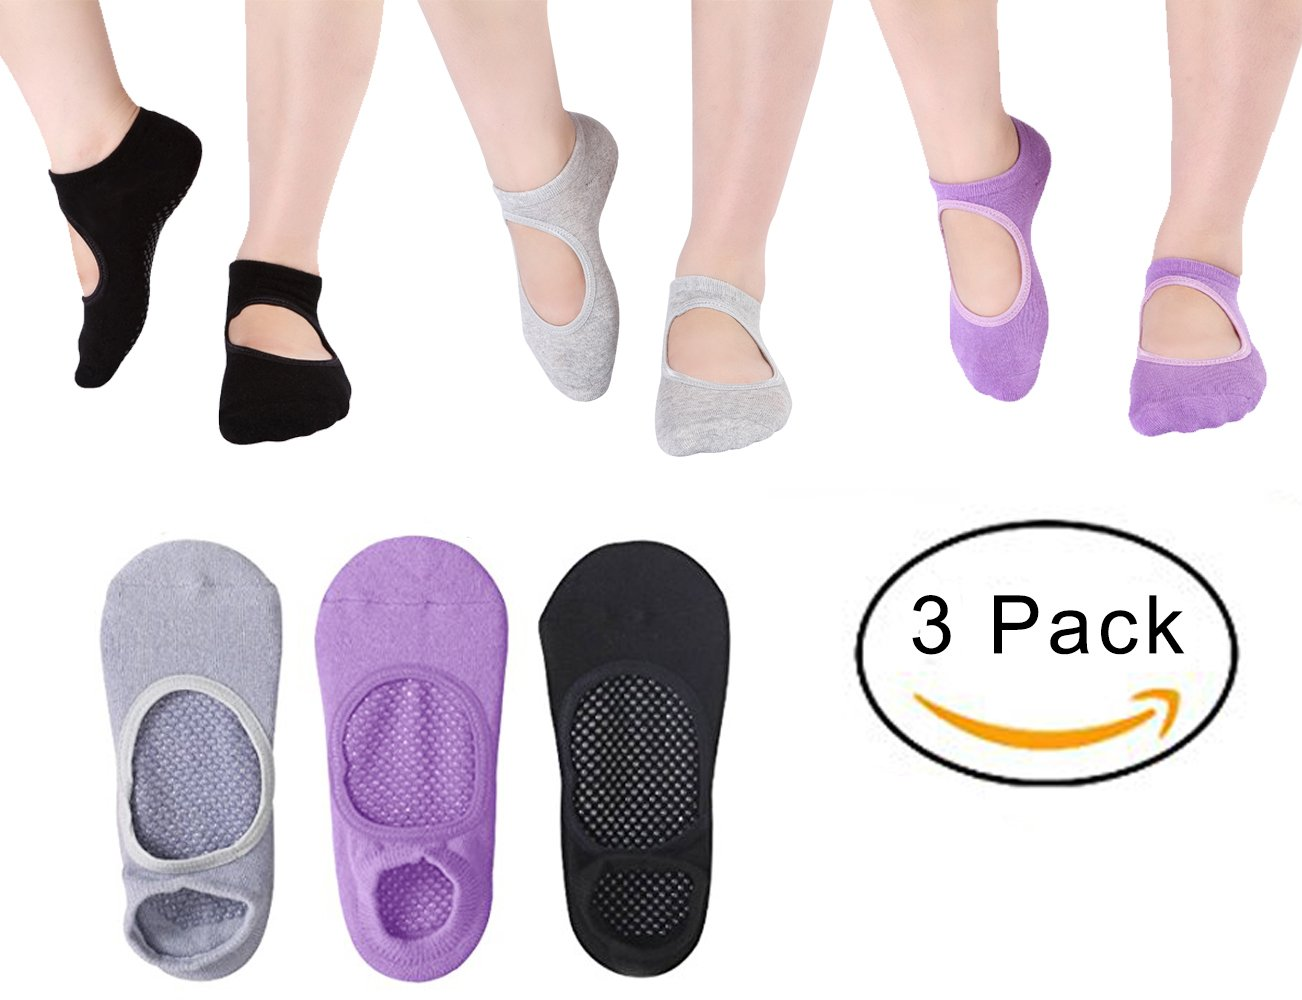 Yoga Socks Women Non Slip Socks Pilates Ballet Barre Socks with Grips Anti-Skid Sox 3 Pairs(Size 5-9)